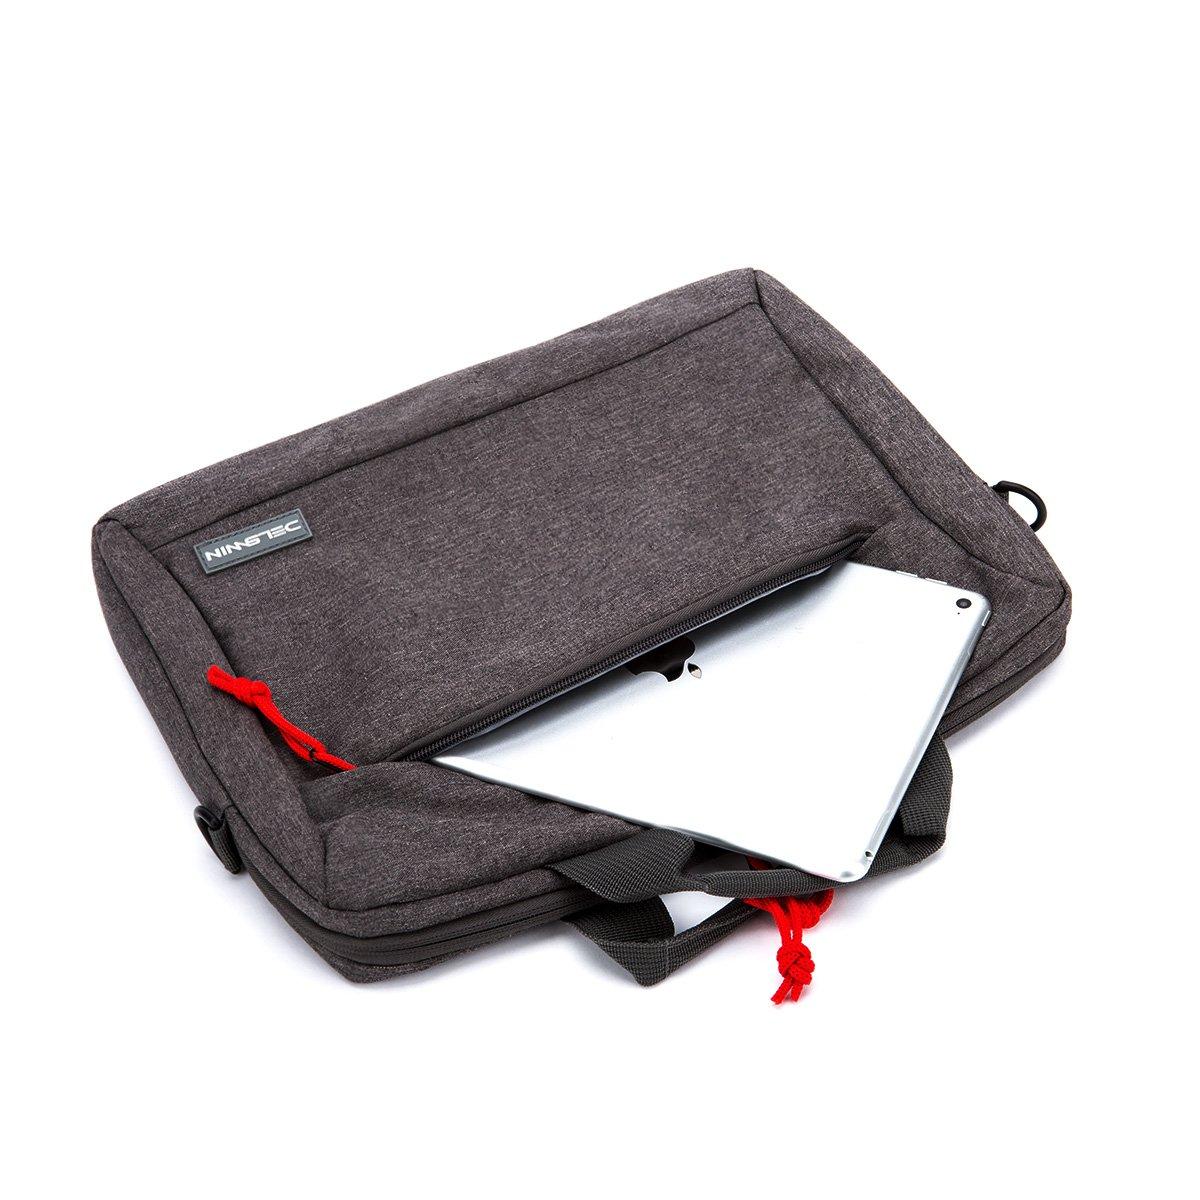 14 Inches Laptop Briefcase Sleeve - Lightweight Laptop Shoulder Messenger Bag Business Carrying Handbag for School/Travel/Women/Men (14.1, Gray)